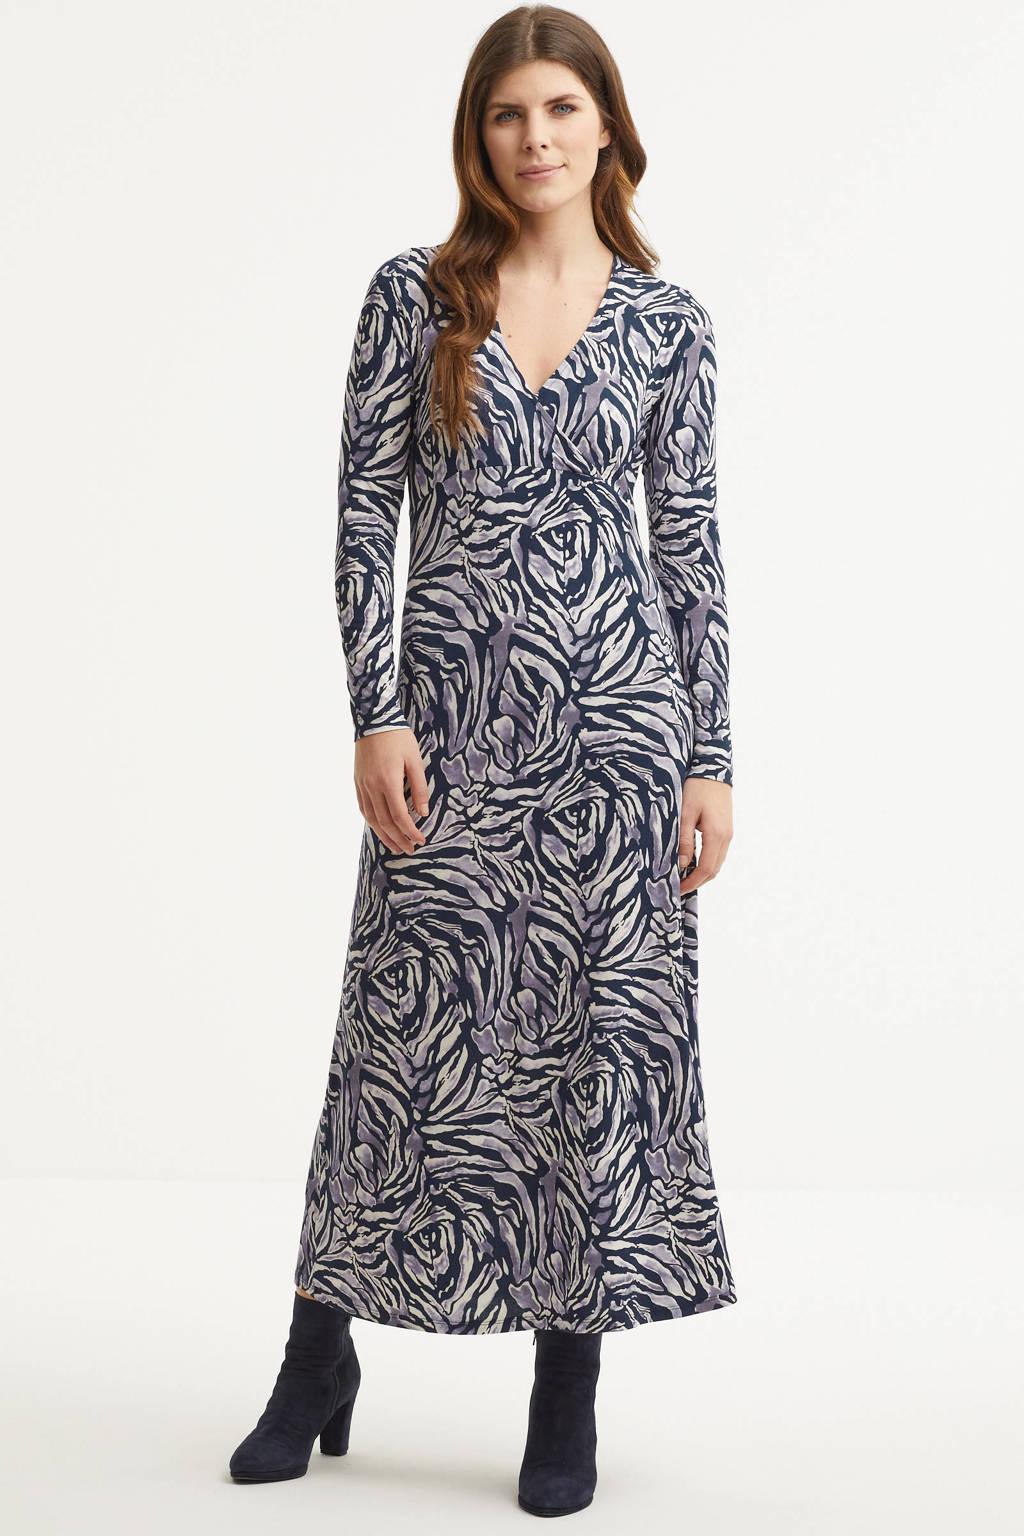 Imagine jurk met all-over print donkerblauw en lila, Donkerblauw/lila